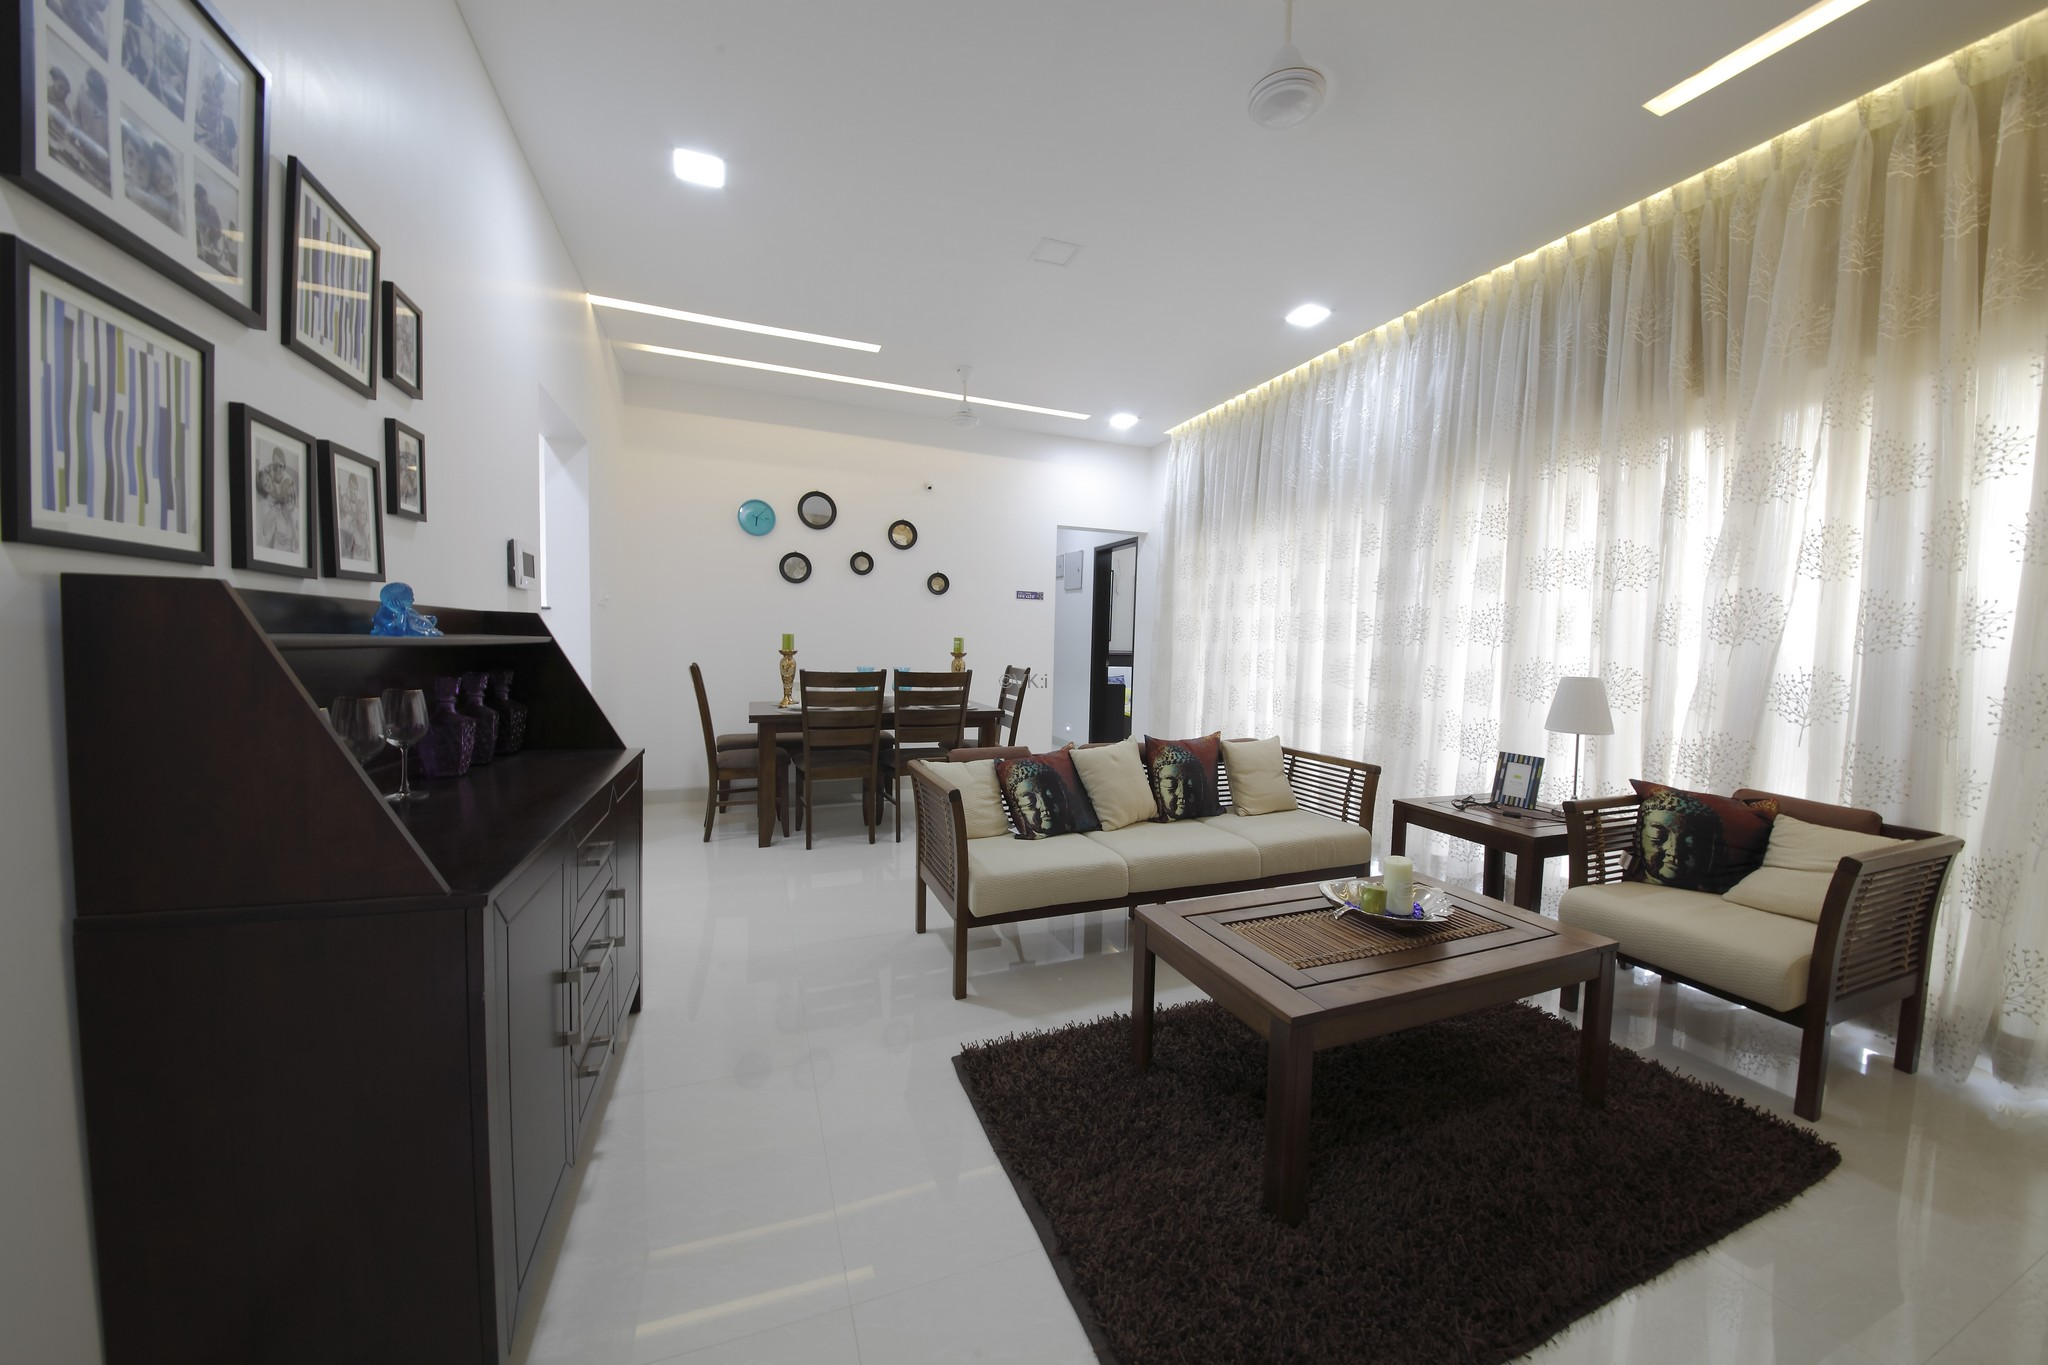 pune municipal corporation main building punawale punawale pune - Sample Of Interior Design